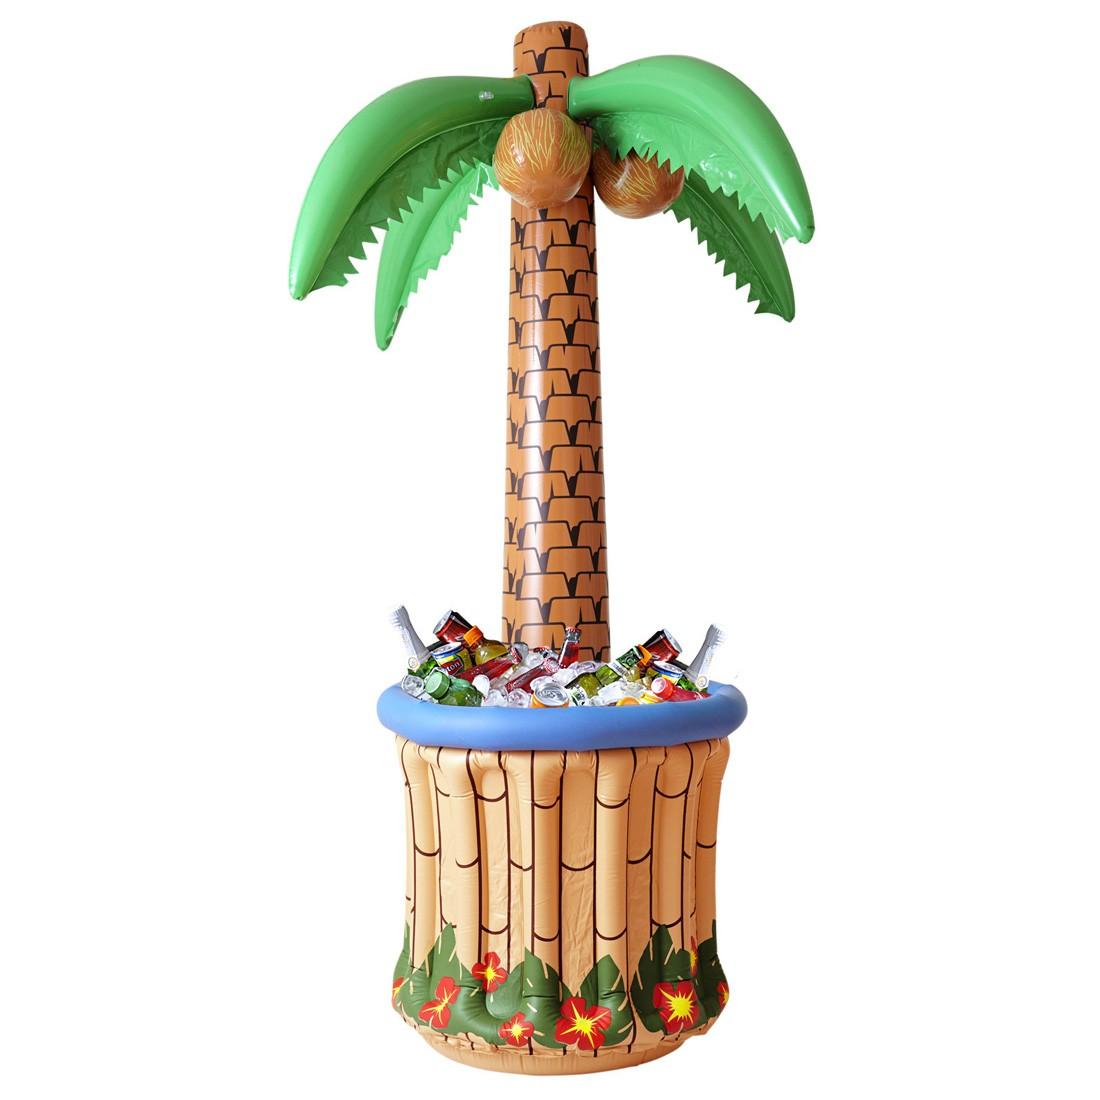 aufblasbare palme mit getr nkek hler partypalme 182 cm palmeninsel fun palme flaschenk hler. Black Bedroom Furniture Sets. Home Design Ideas